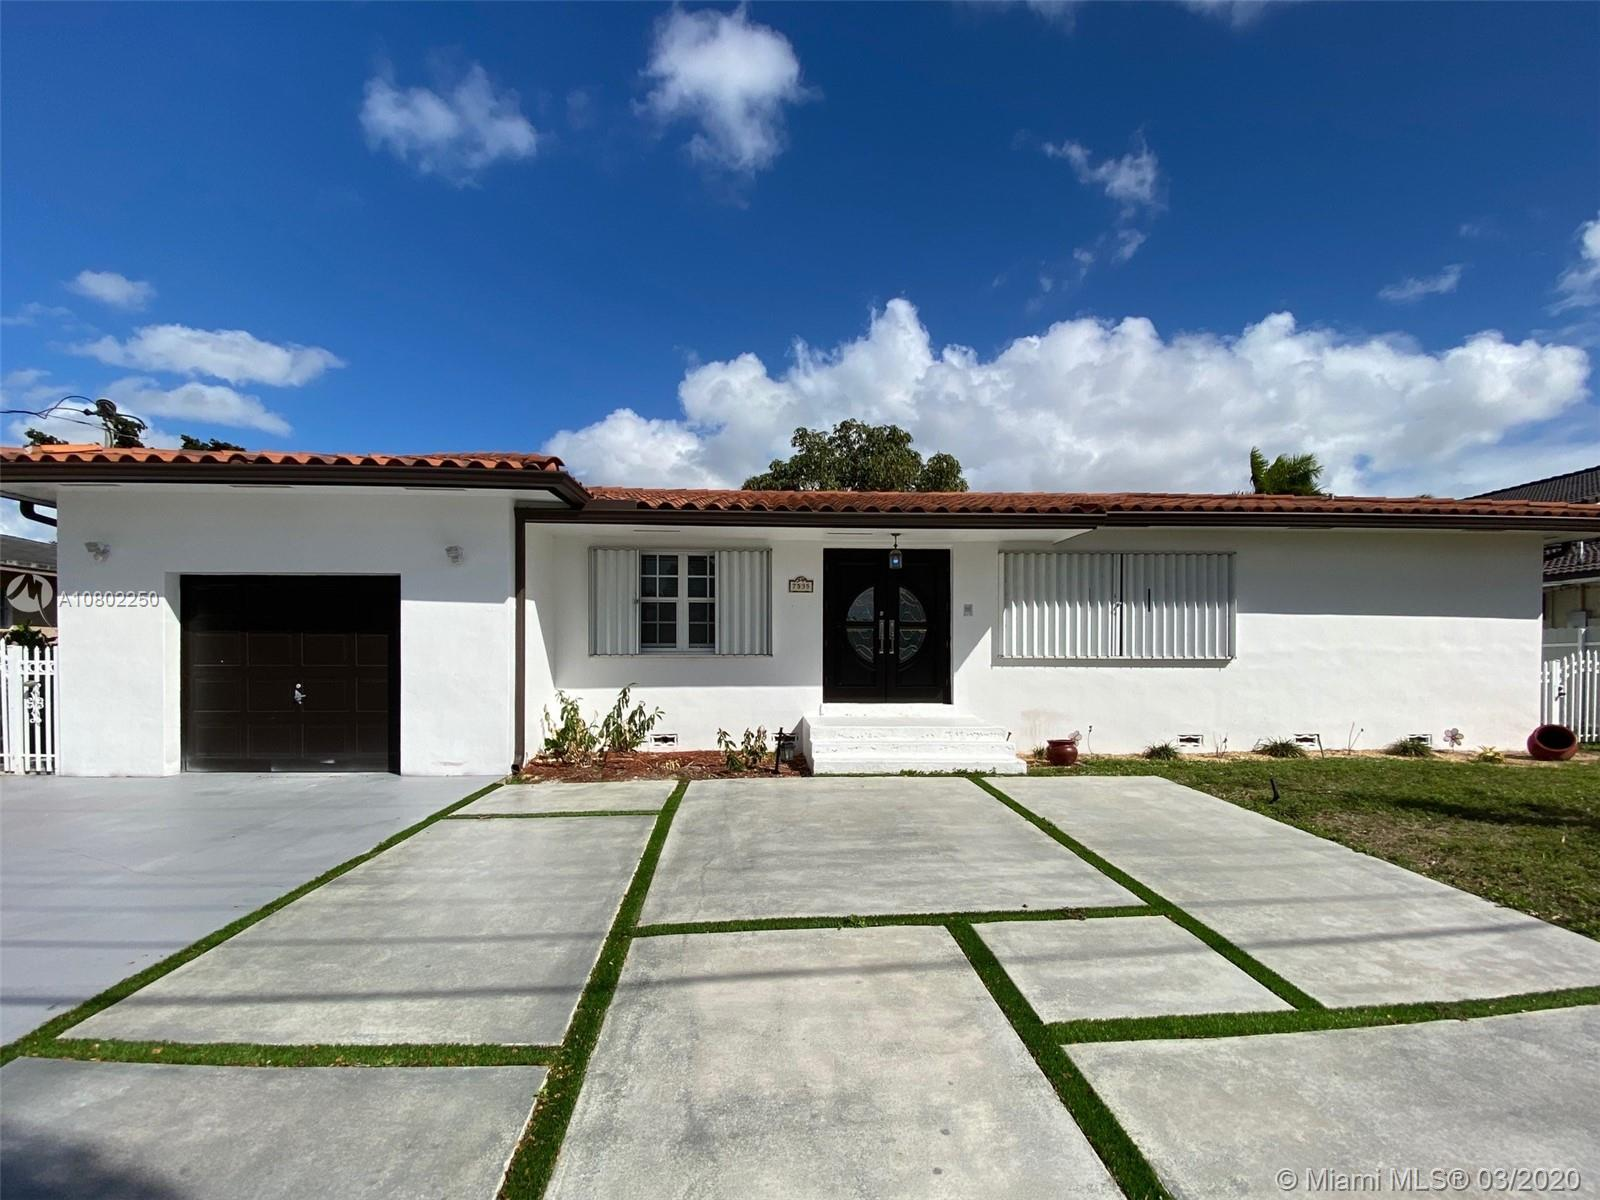 7535 W 14th Ave, Hialeah, FL 33014